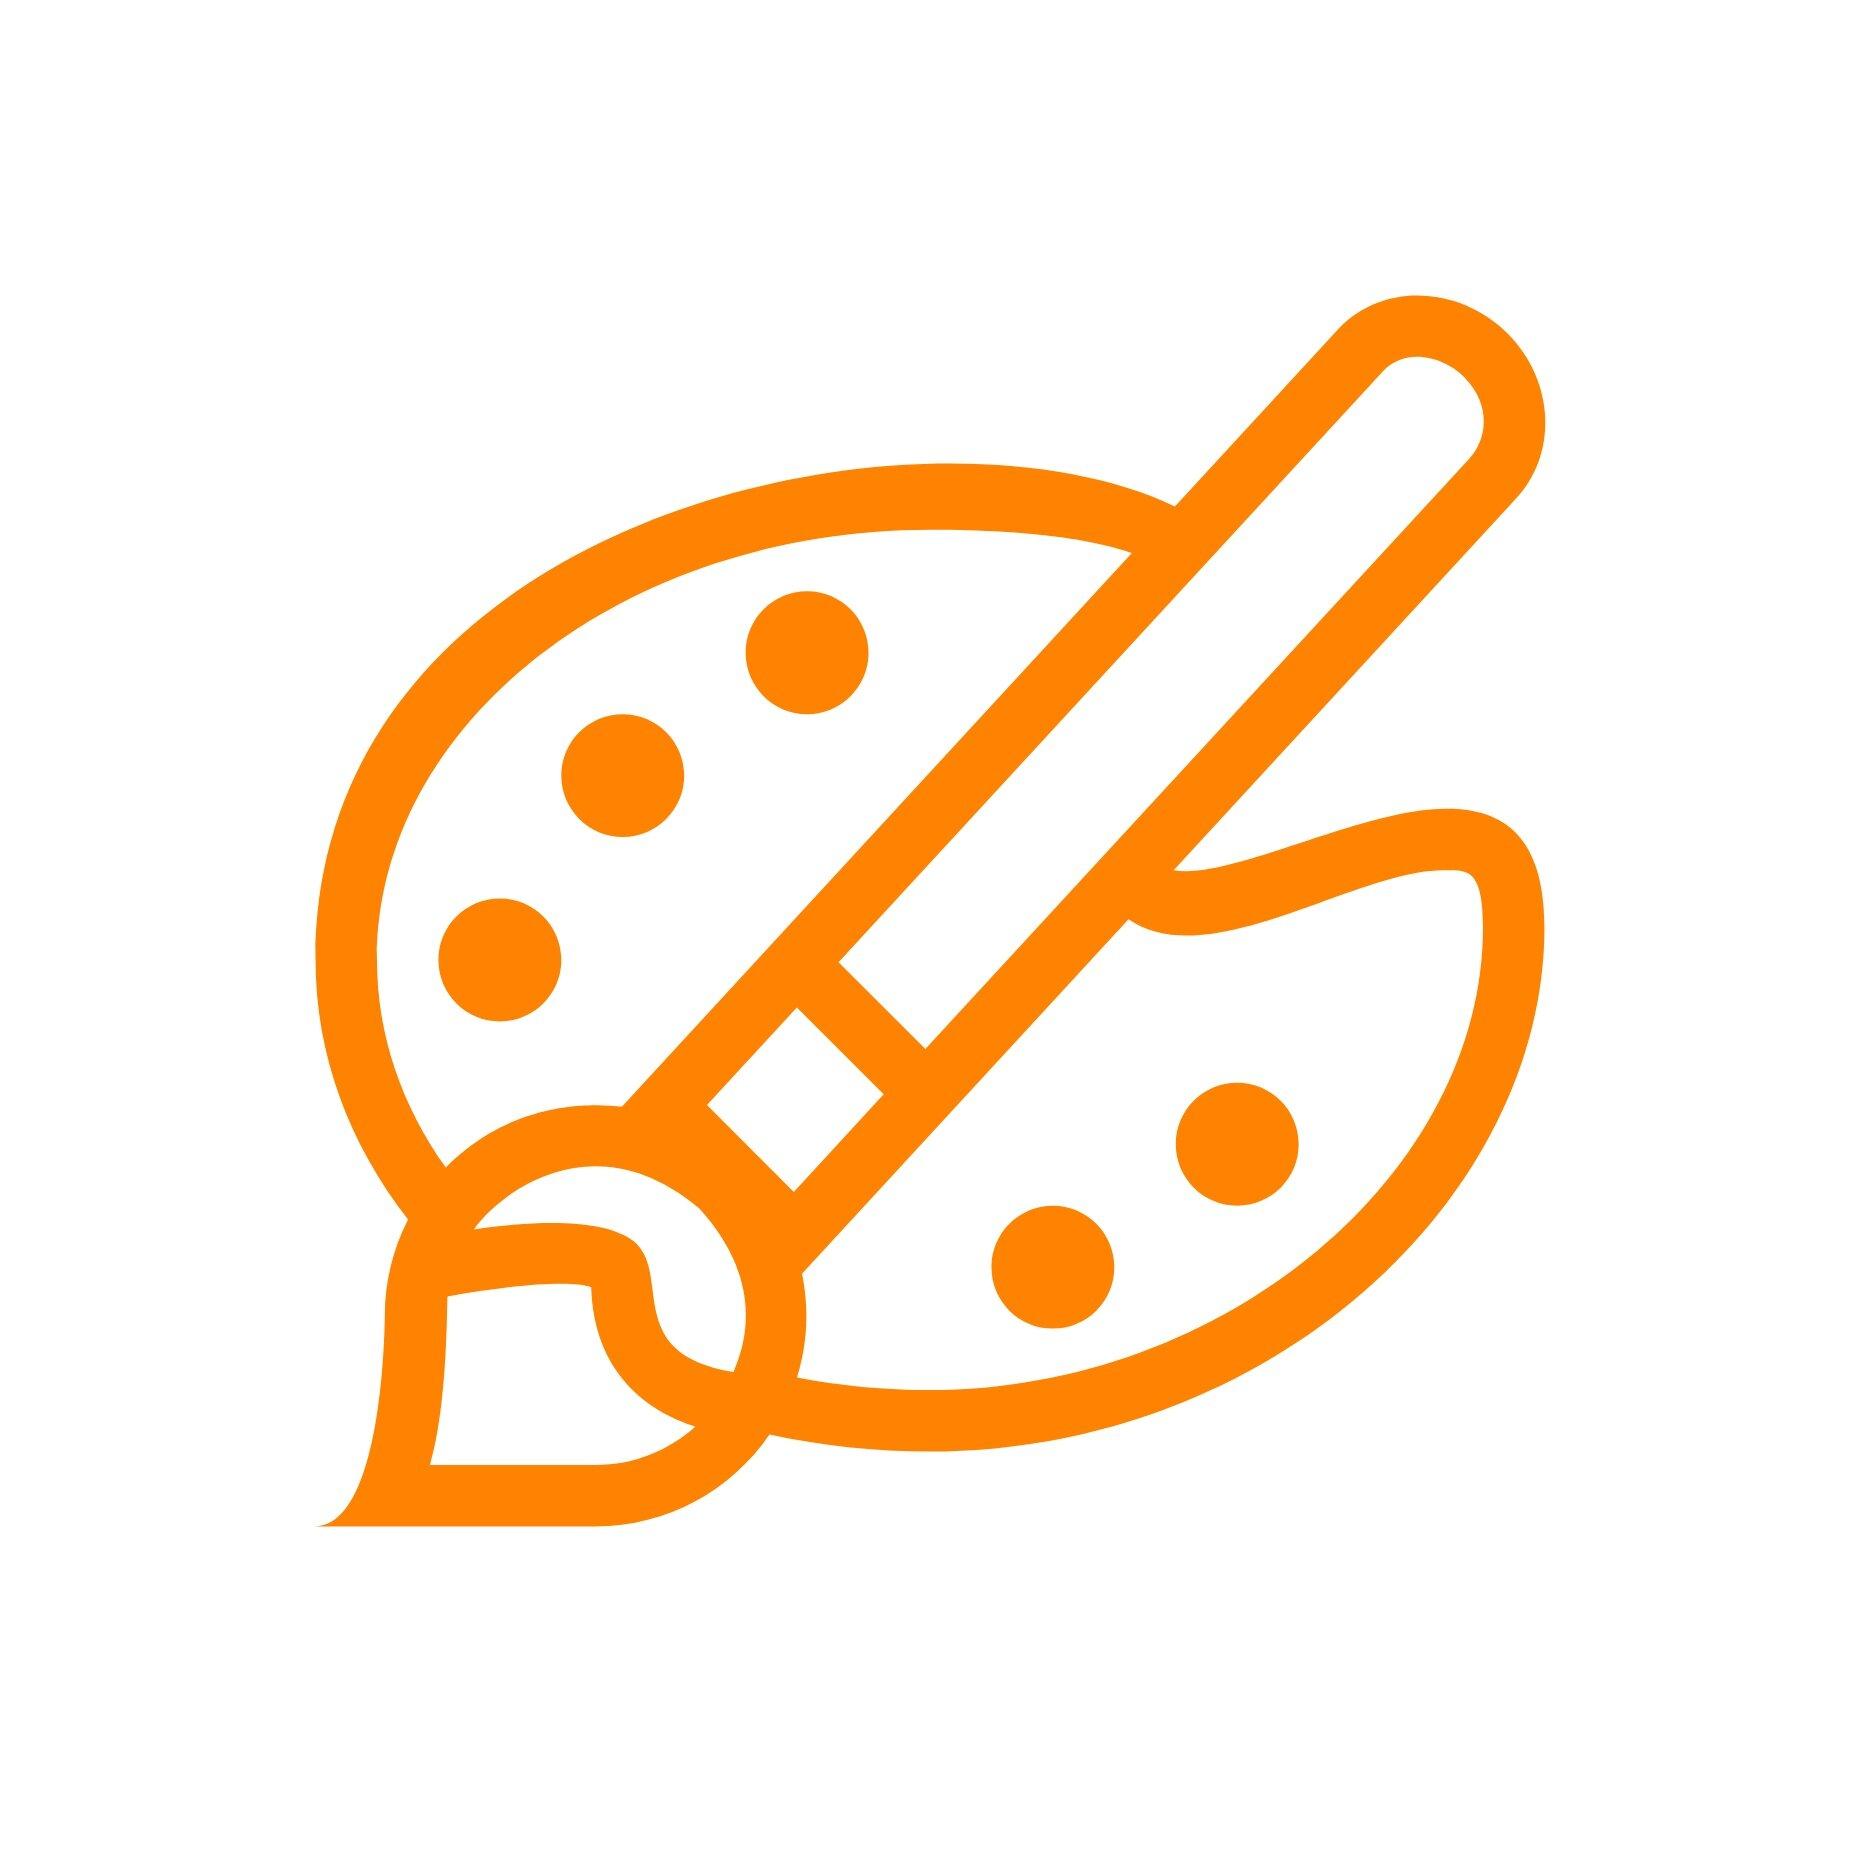 logo+%2863%29.jpg